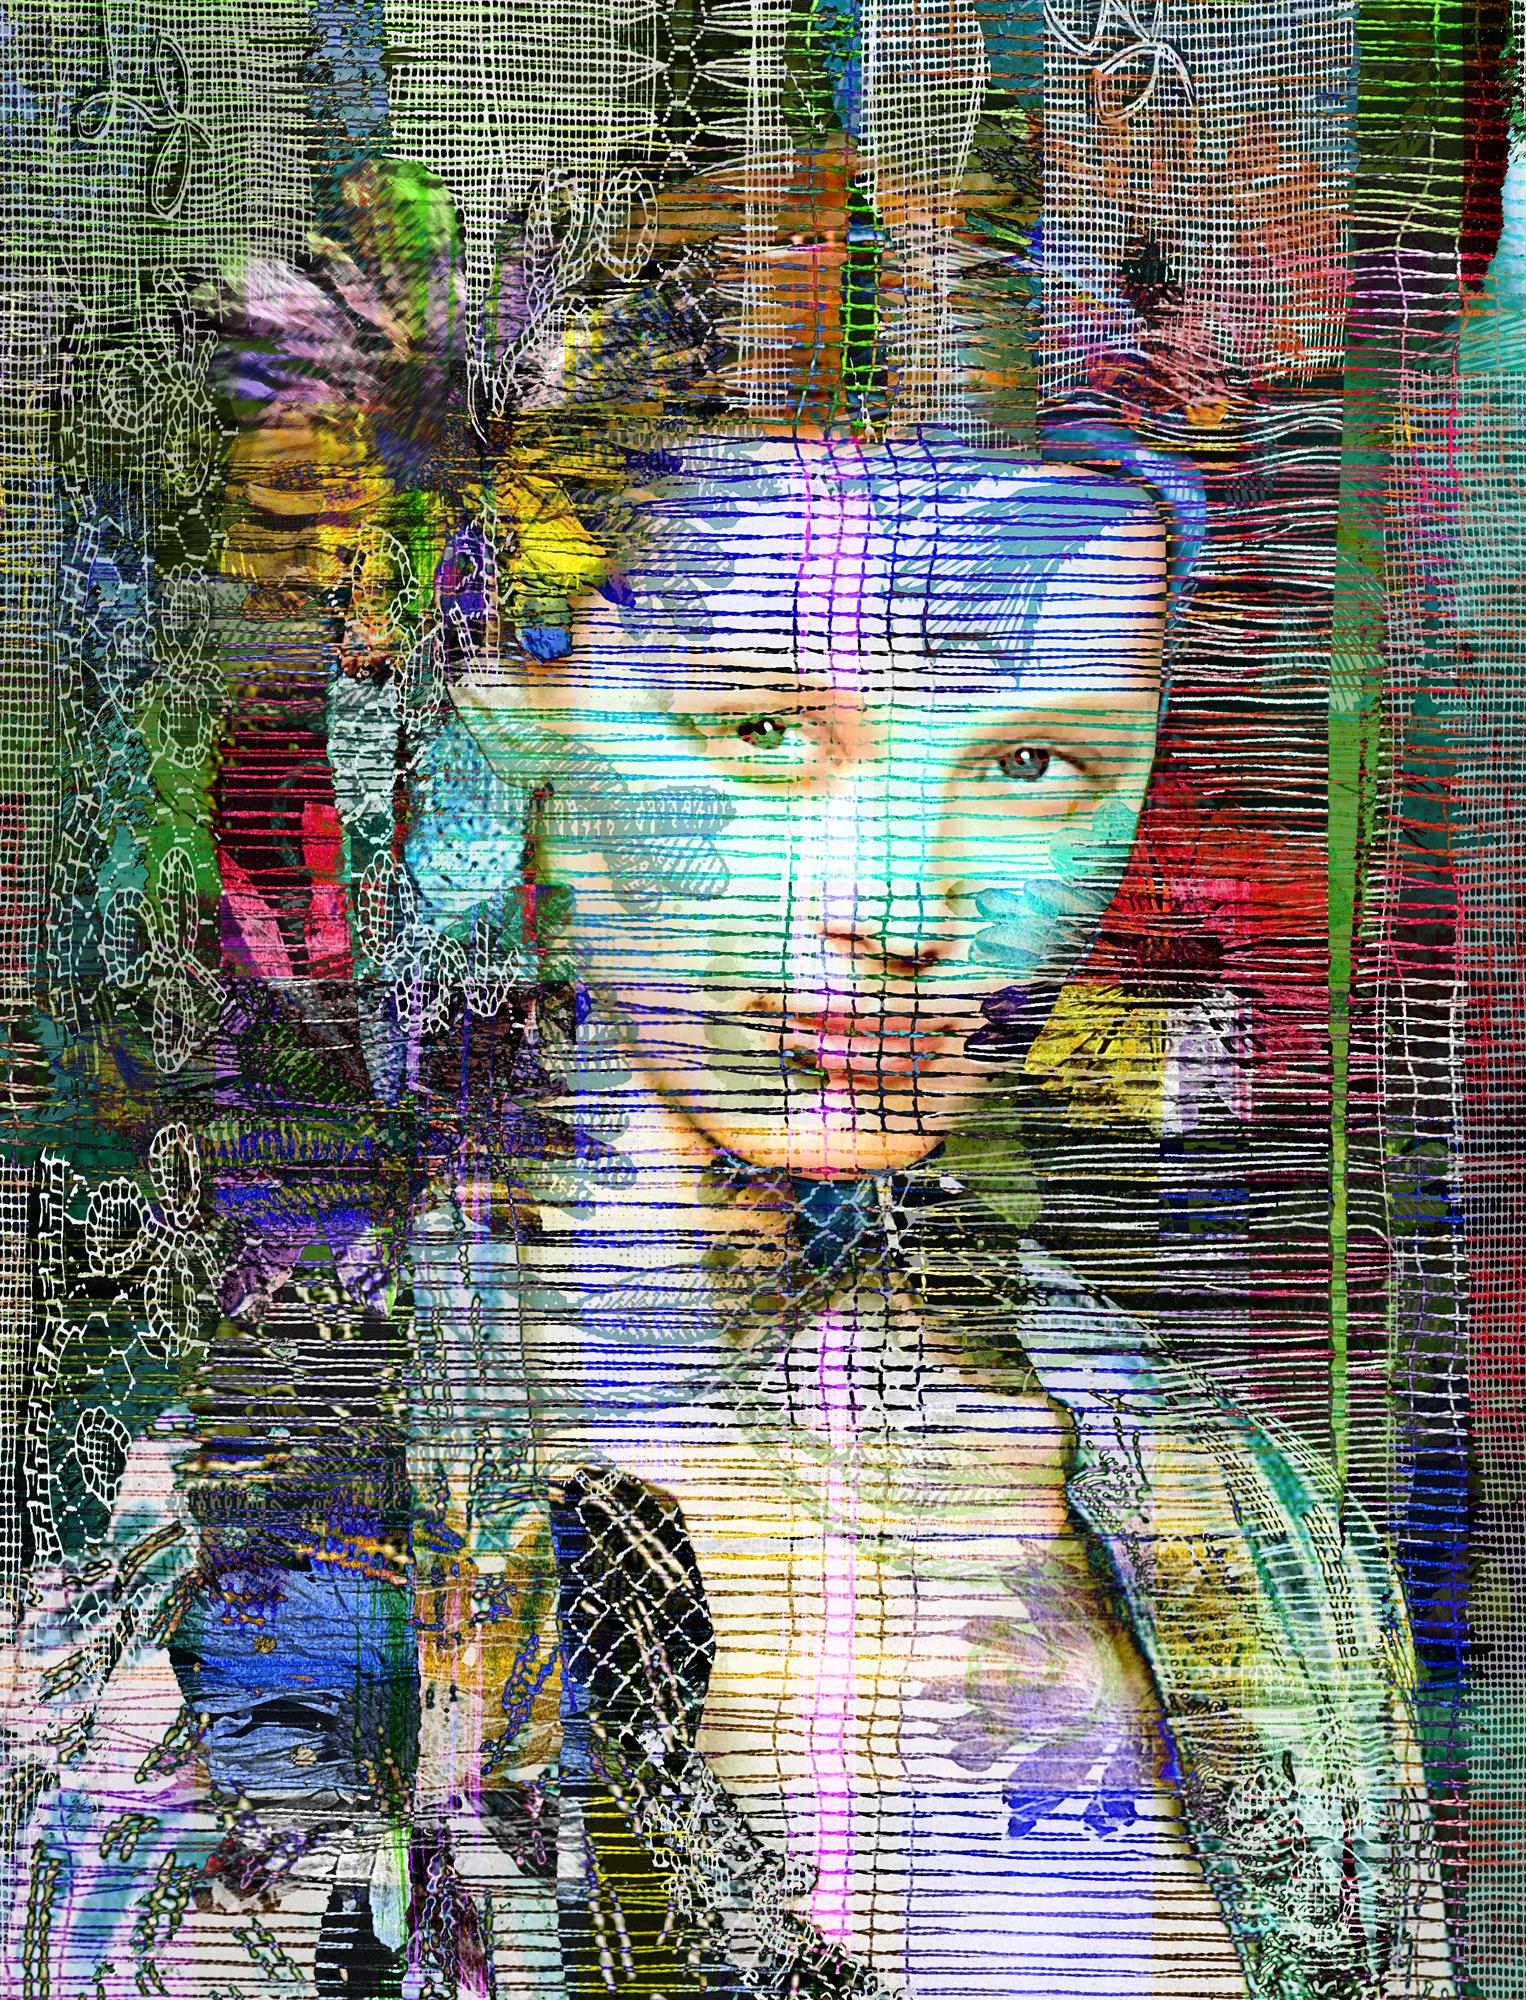 Spiritual Metamorphosis by floriaiglenoir on DeviantArt